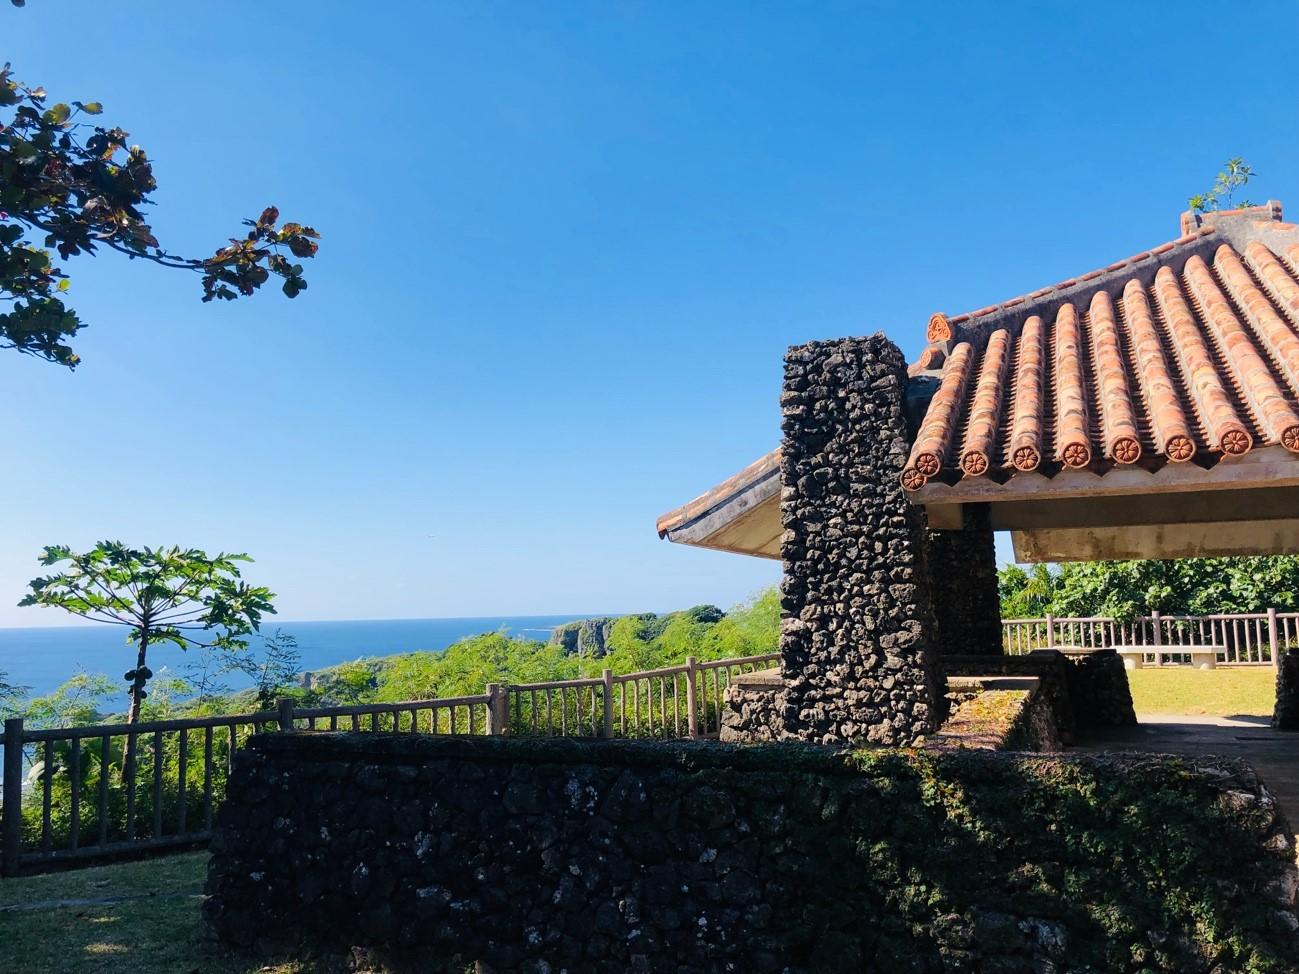 沖縄県糸満市「平和祈念公園」の赤瓦の東屋